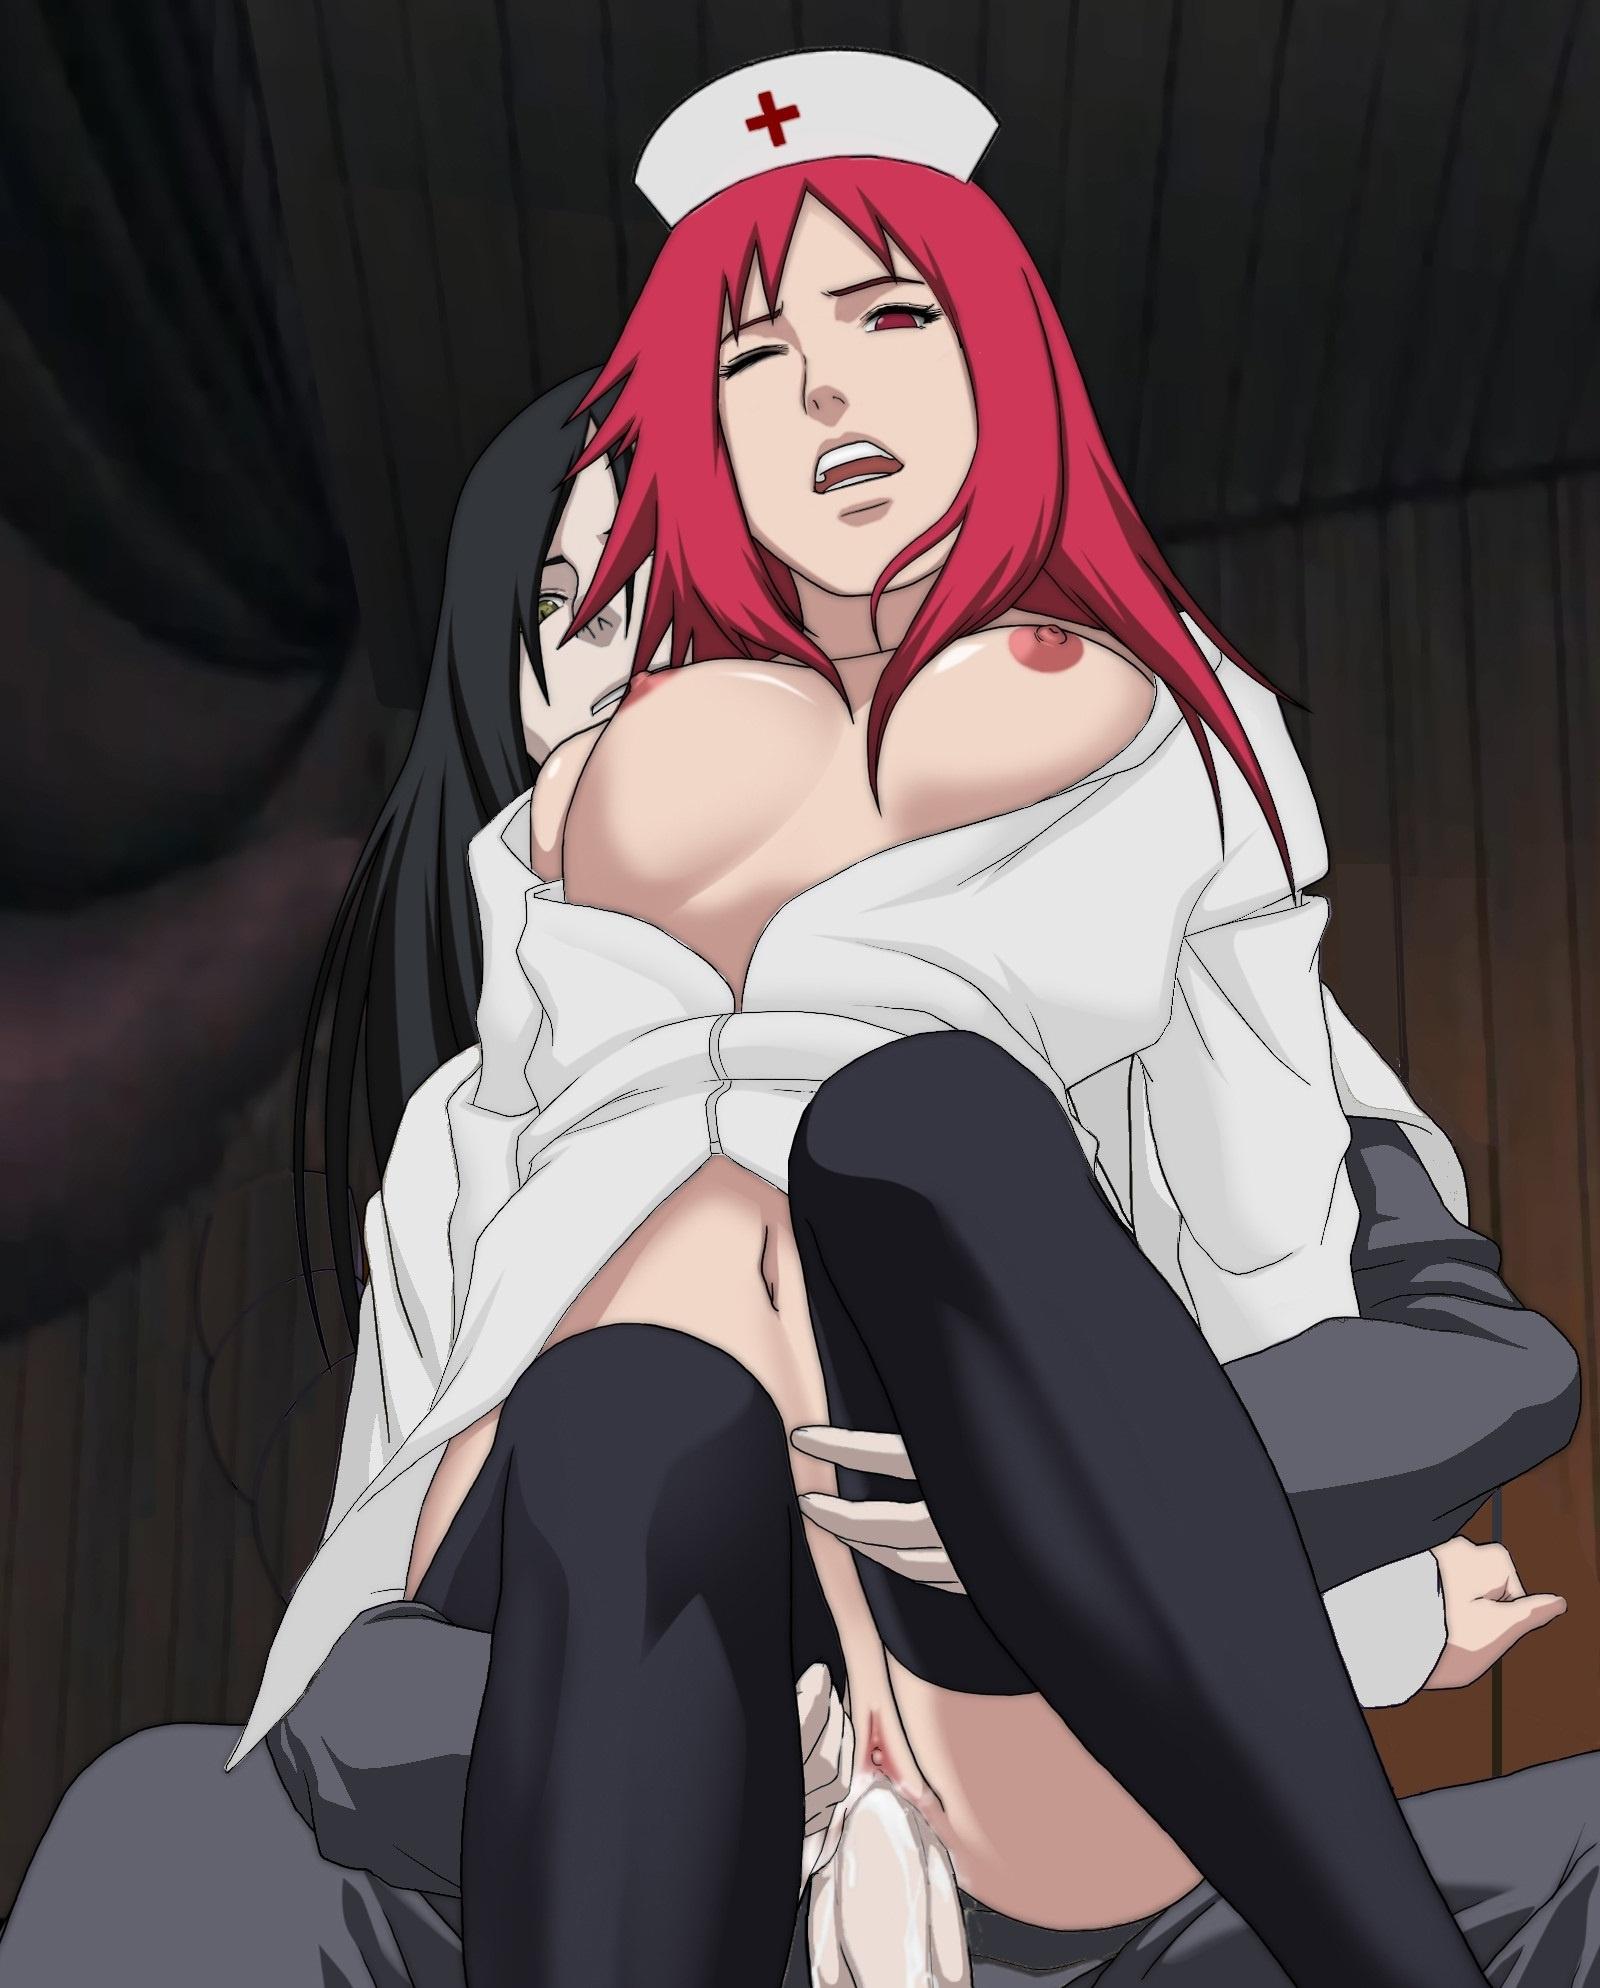 donna feldman nude pics